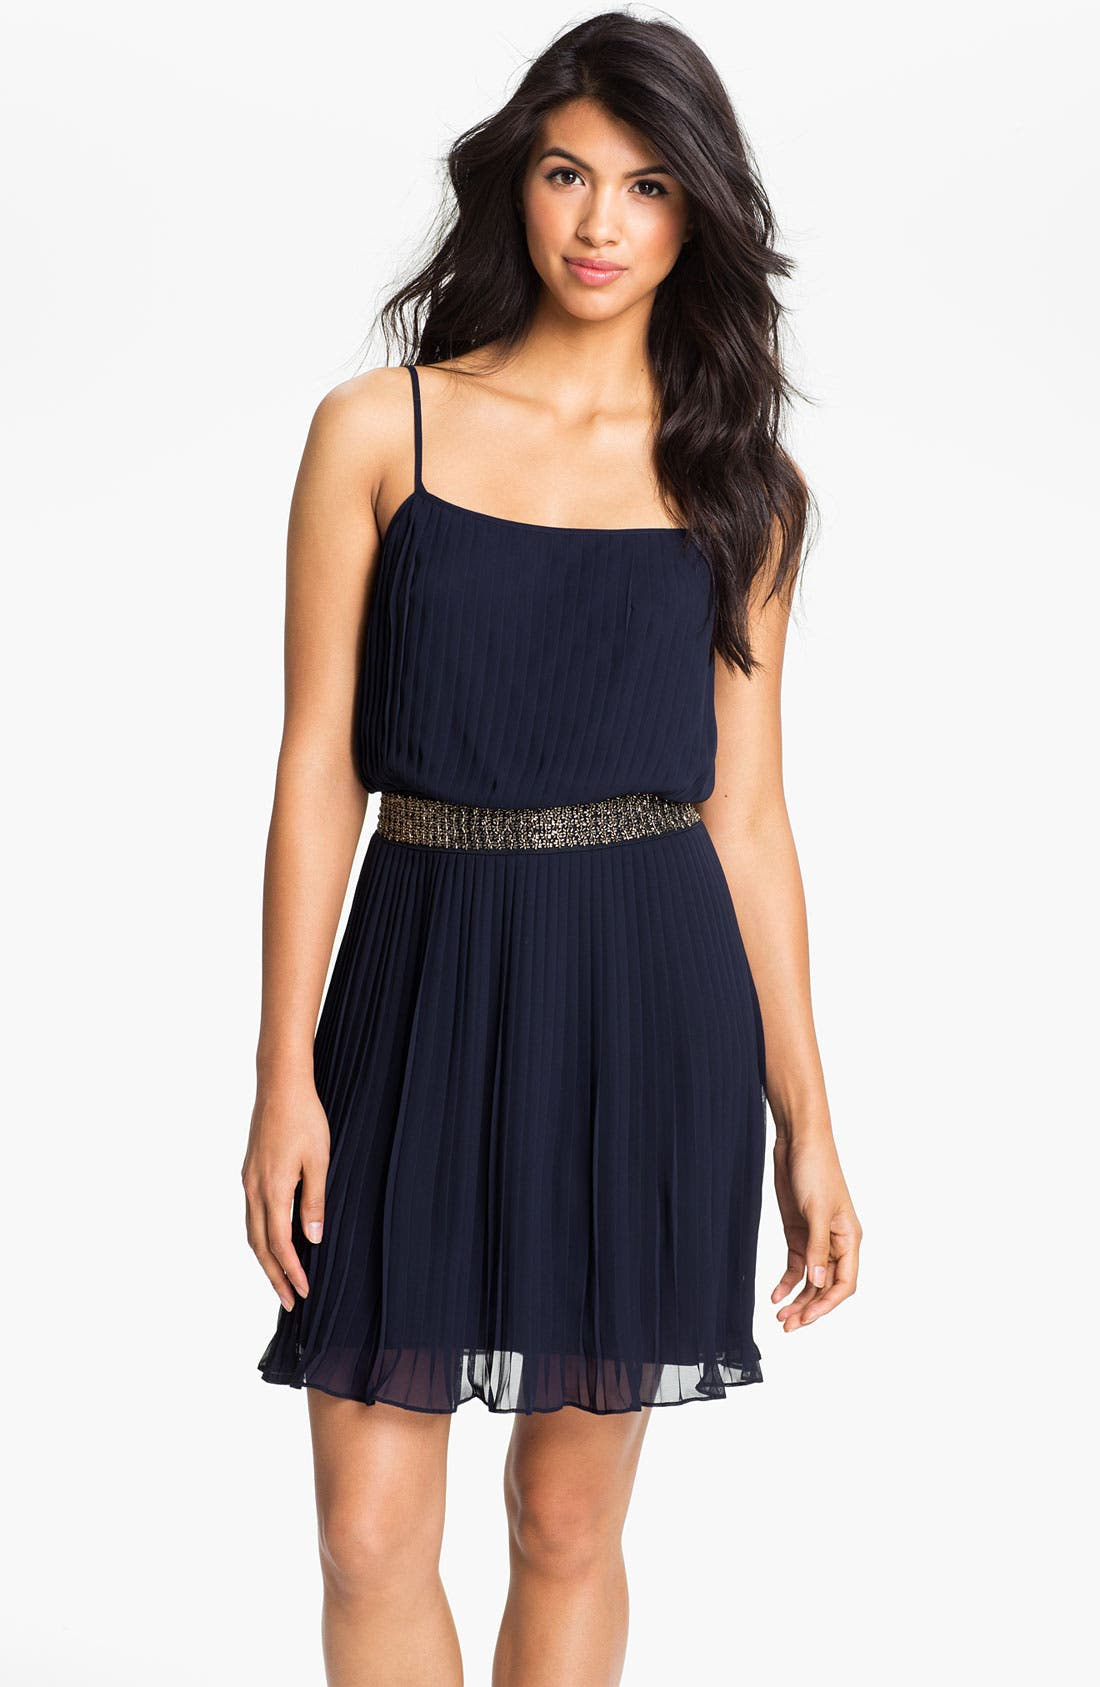 Alternate Image 1 Selected - Adrianna Papell Beaded Pleated Chiffon Dress (Petite)